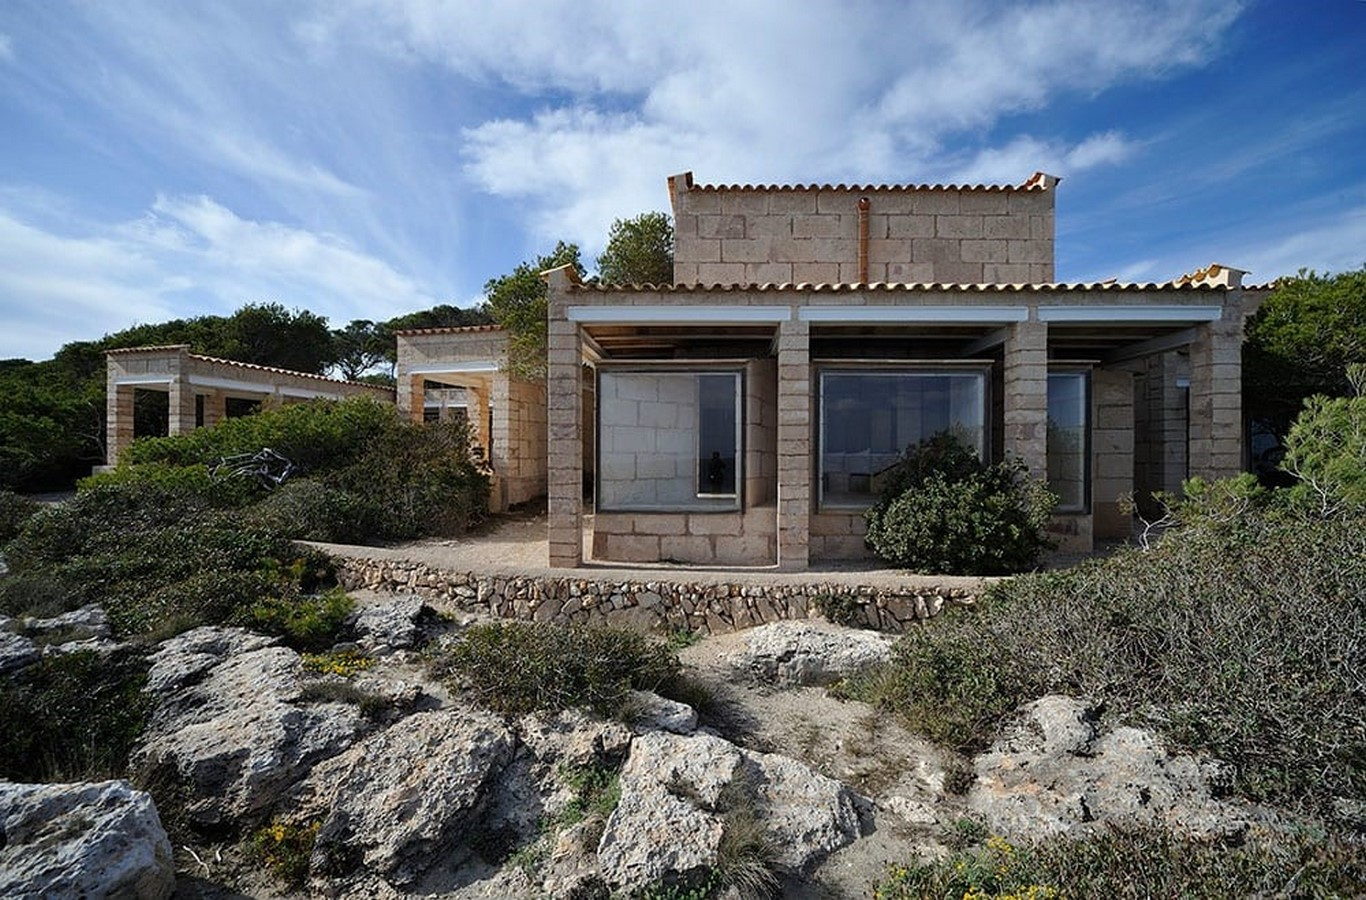 Can Lis House by Jørn Utzon: Reinterpreting the traditional methods - Sheet3